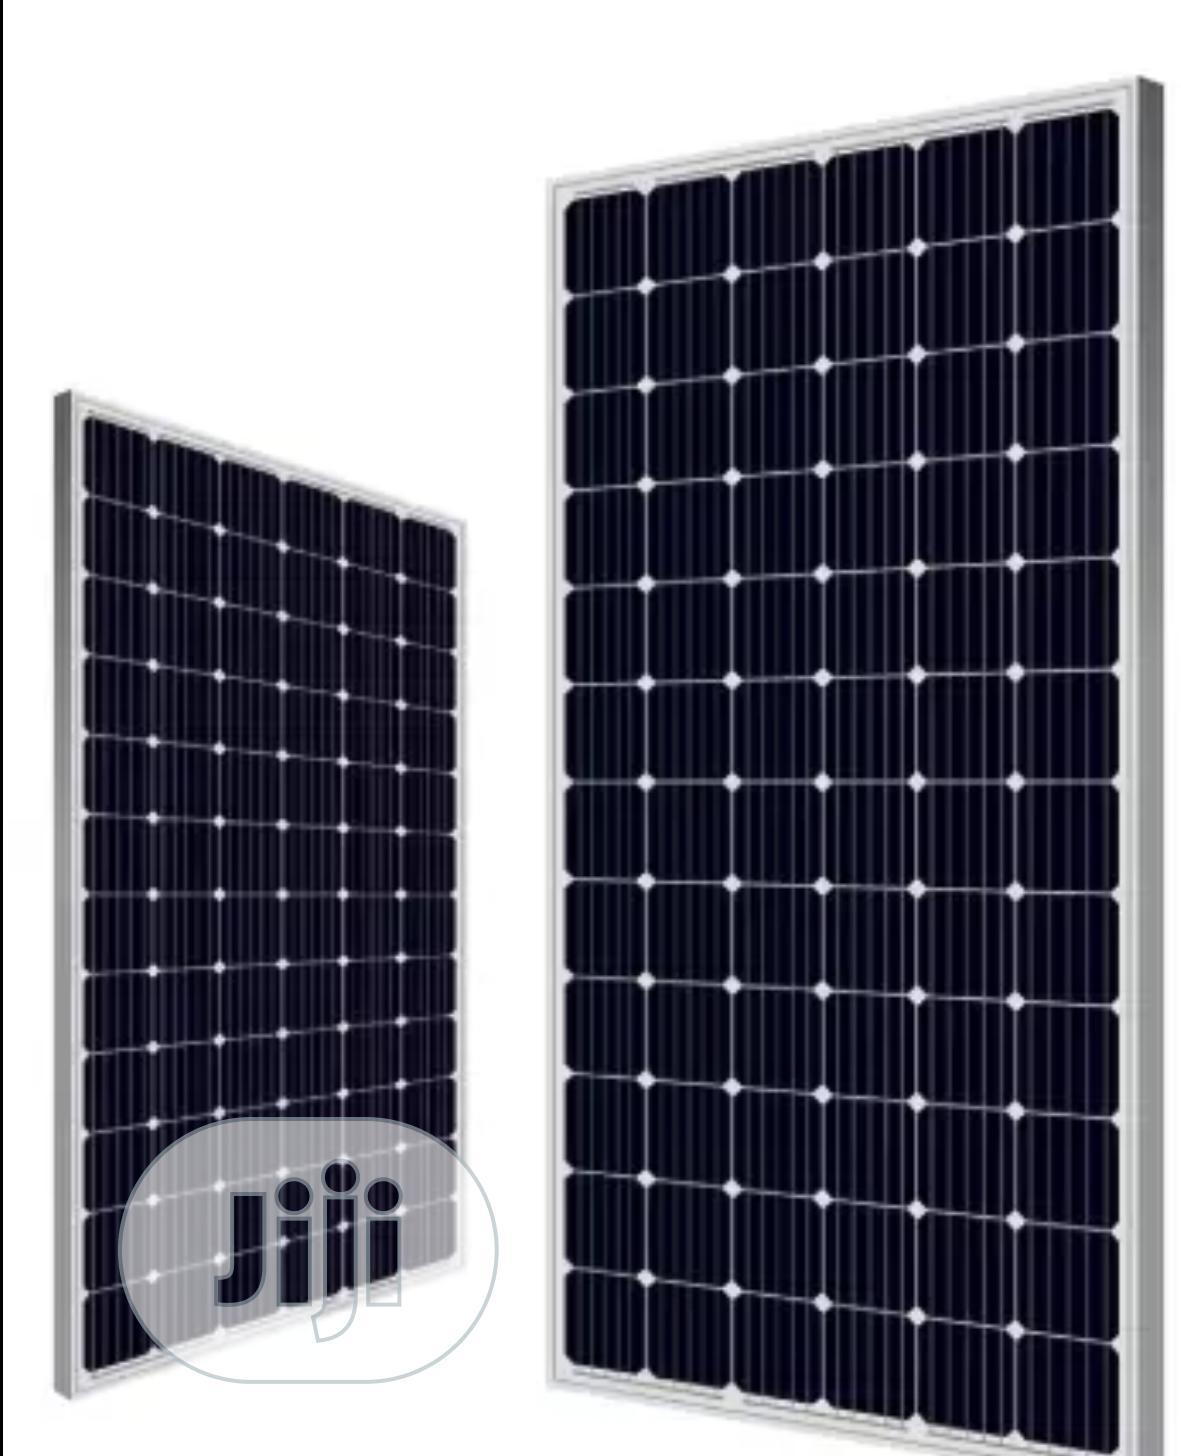 2HP Solar Water Pump | Manufacturing Equipment for sale in Lekki Phase 1, Lagos State, Nigeria